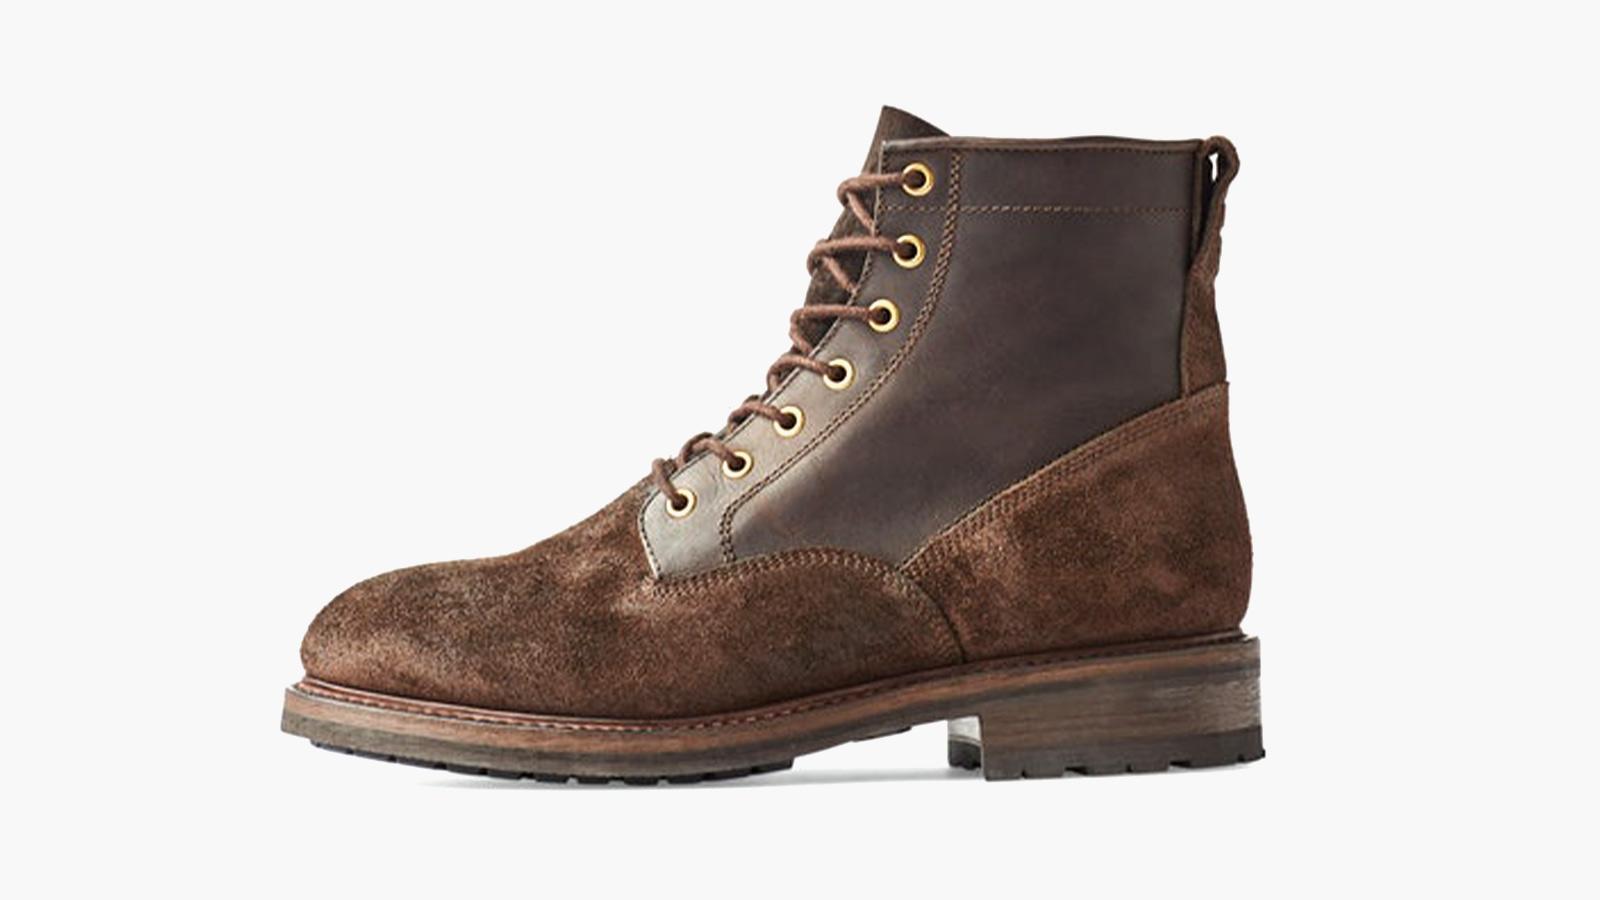 Filson Service Boots 2